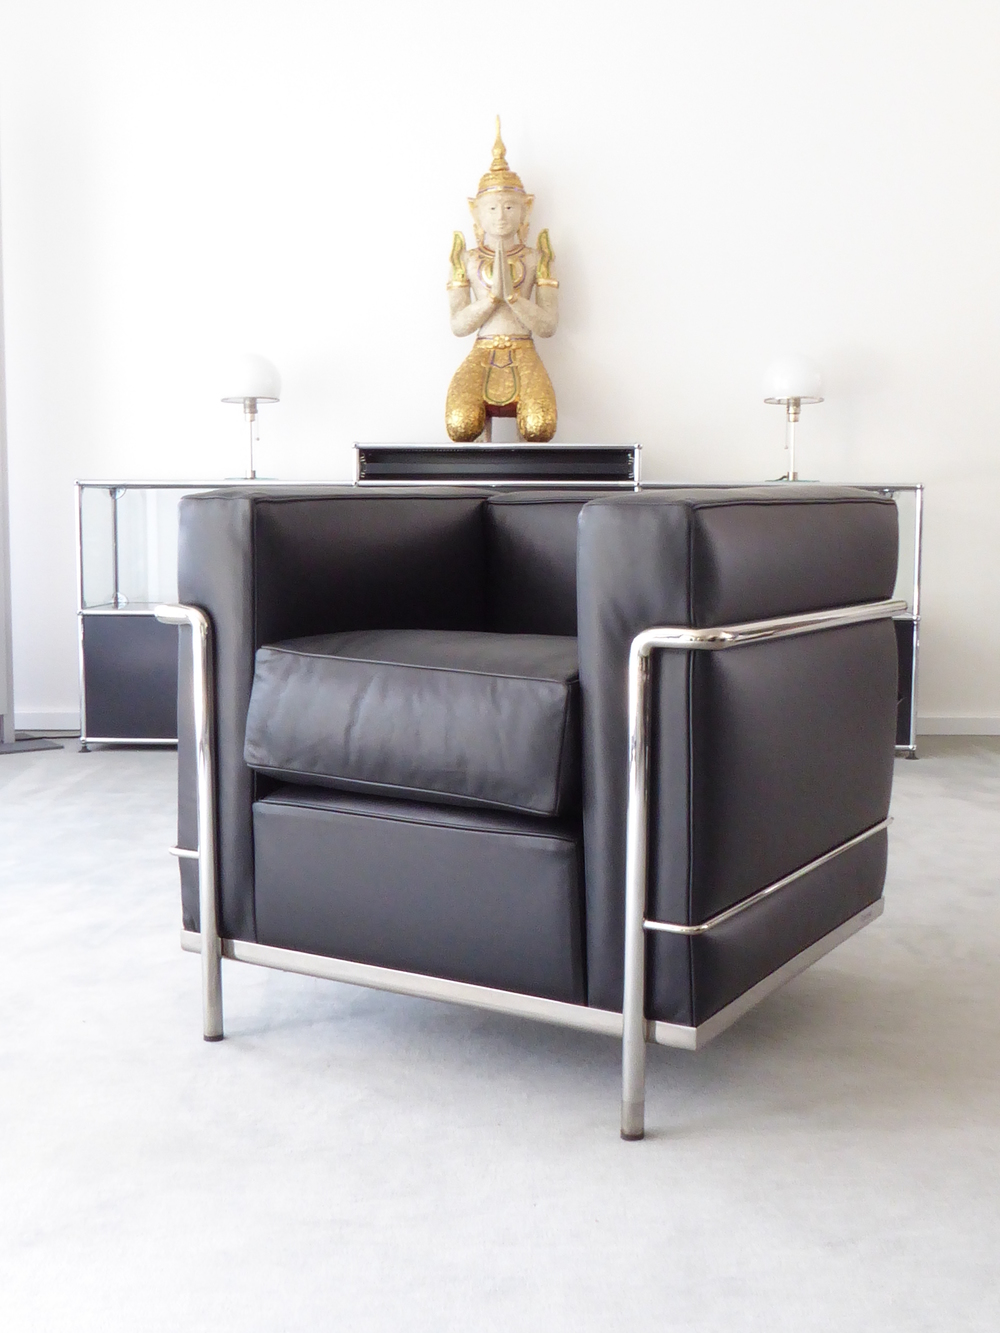 le corbusier sessel cool le corbusier sessel lc with le. Black Bedroom Furniture Sets. Home Design Ideas